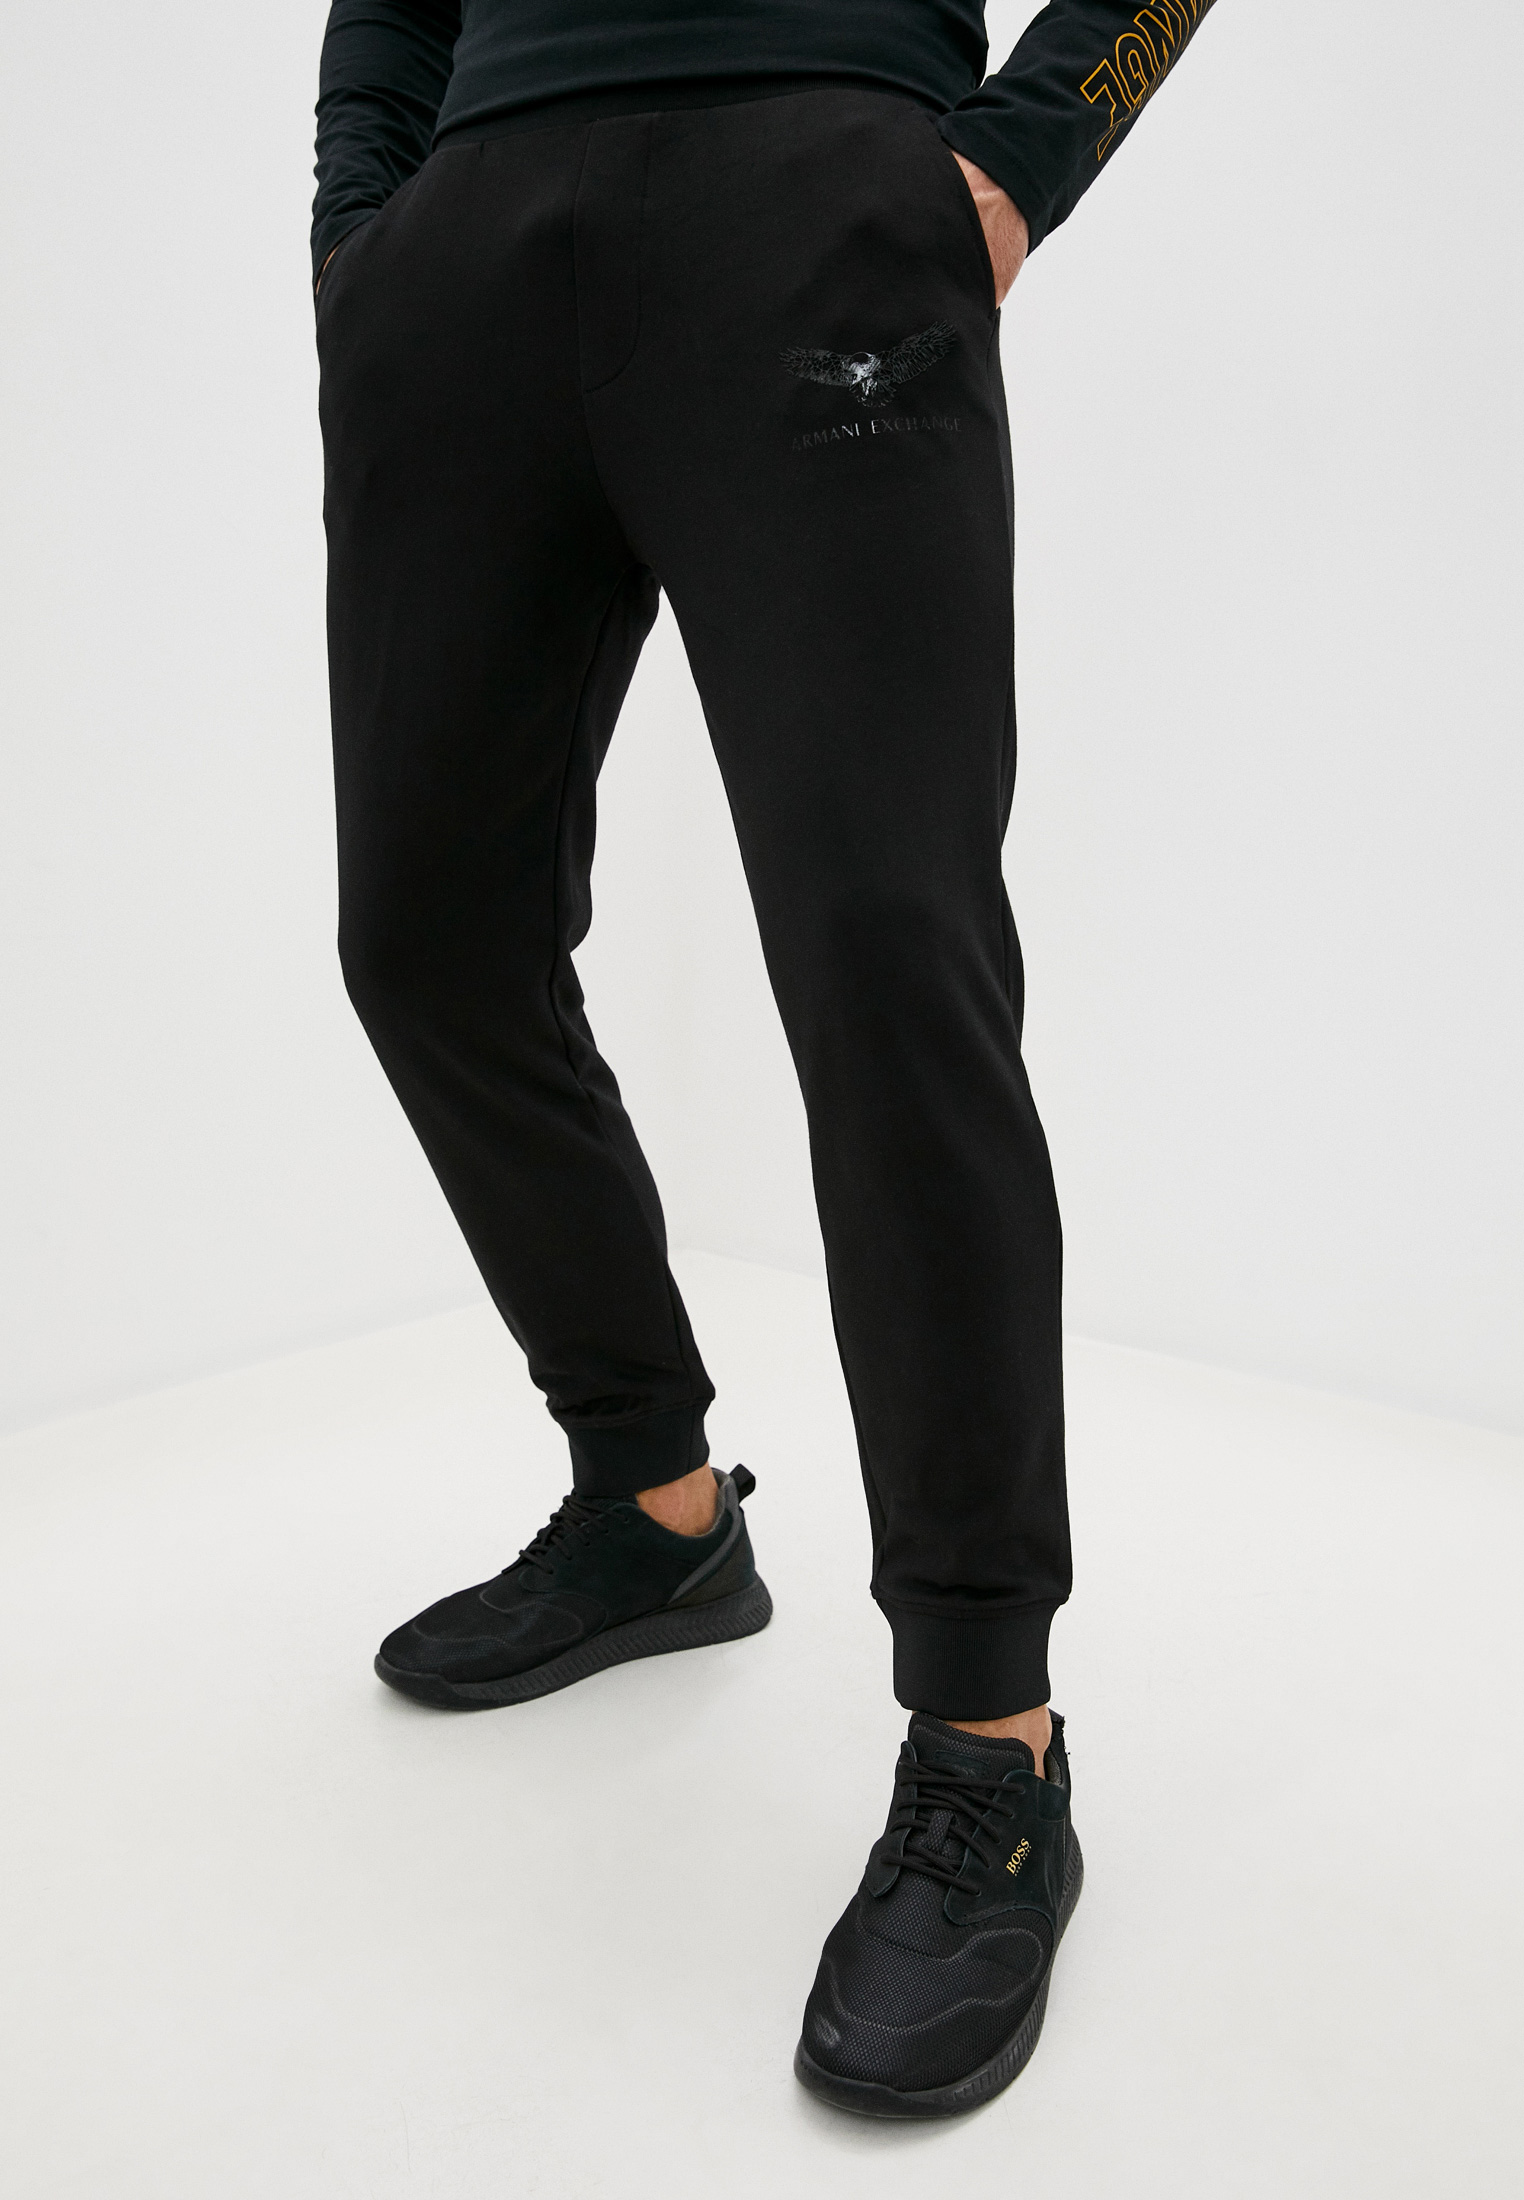 Мужские спортивные брюки Armani Exchange 6hzpfy ZJ5CZ